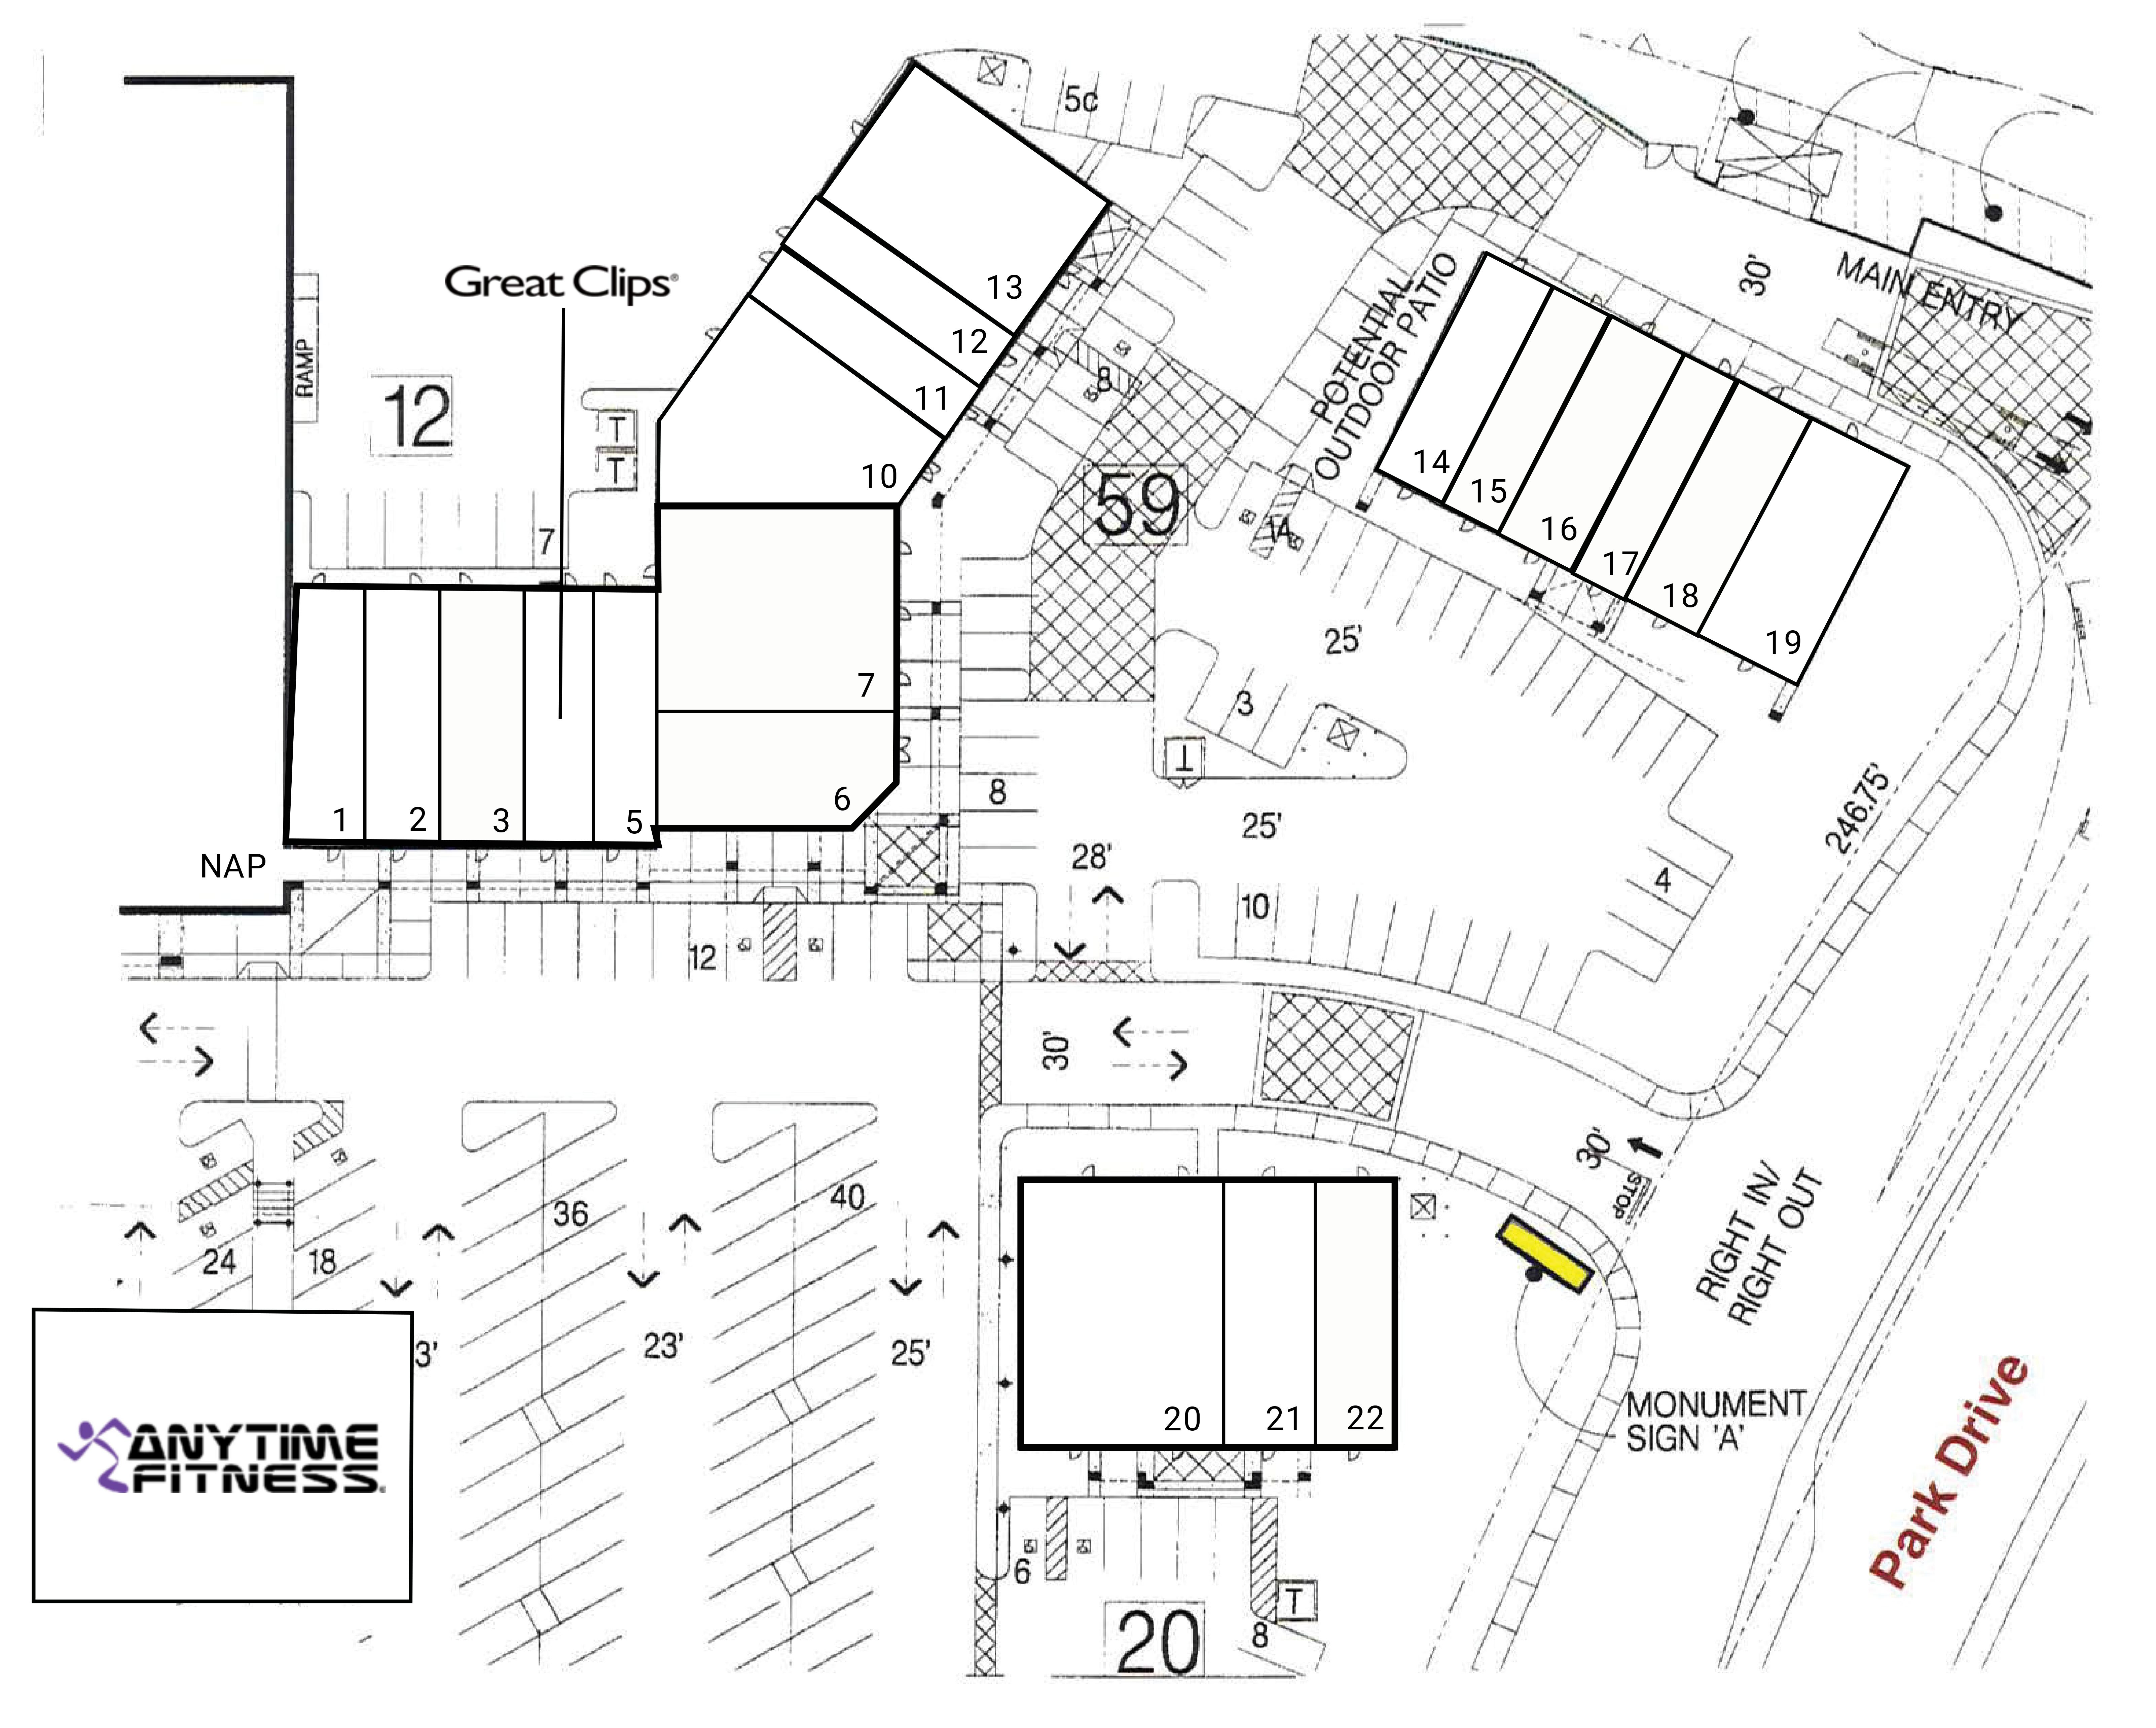 Stanford Ranch Plaza: site plan